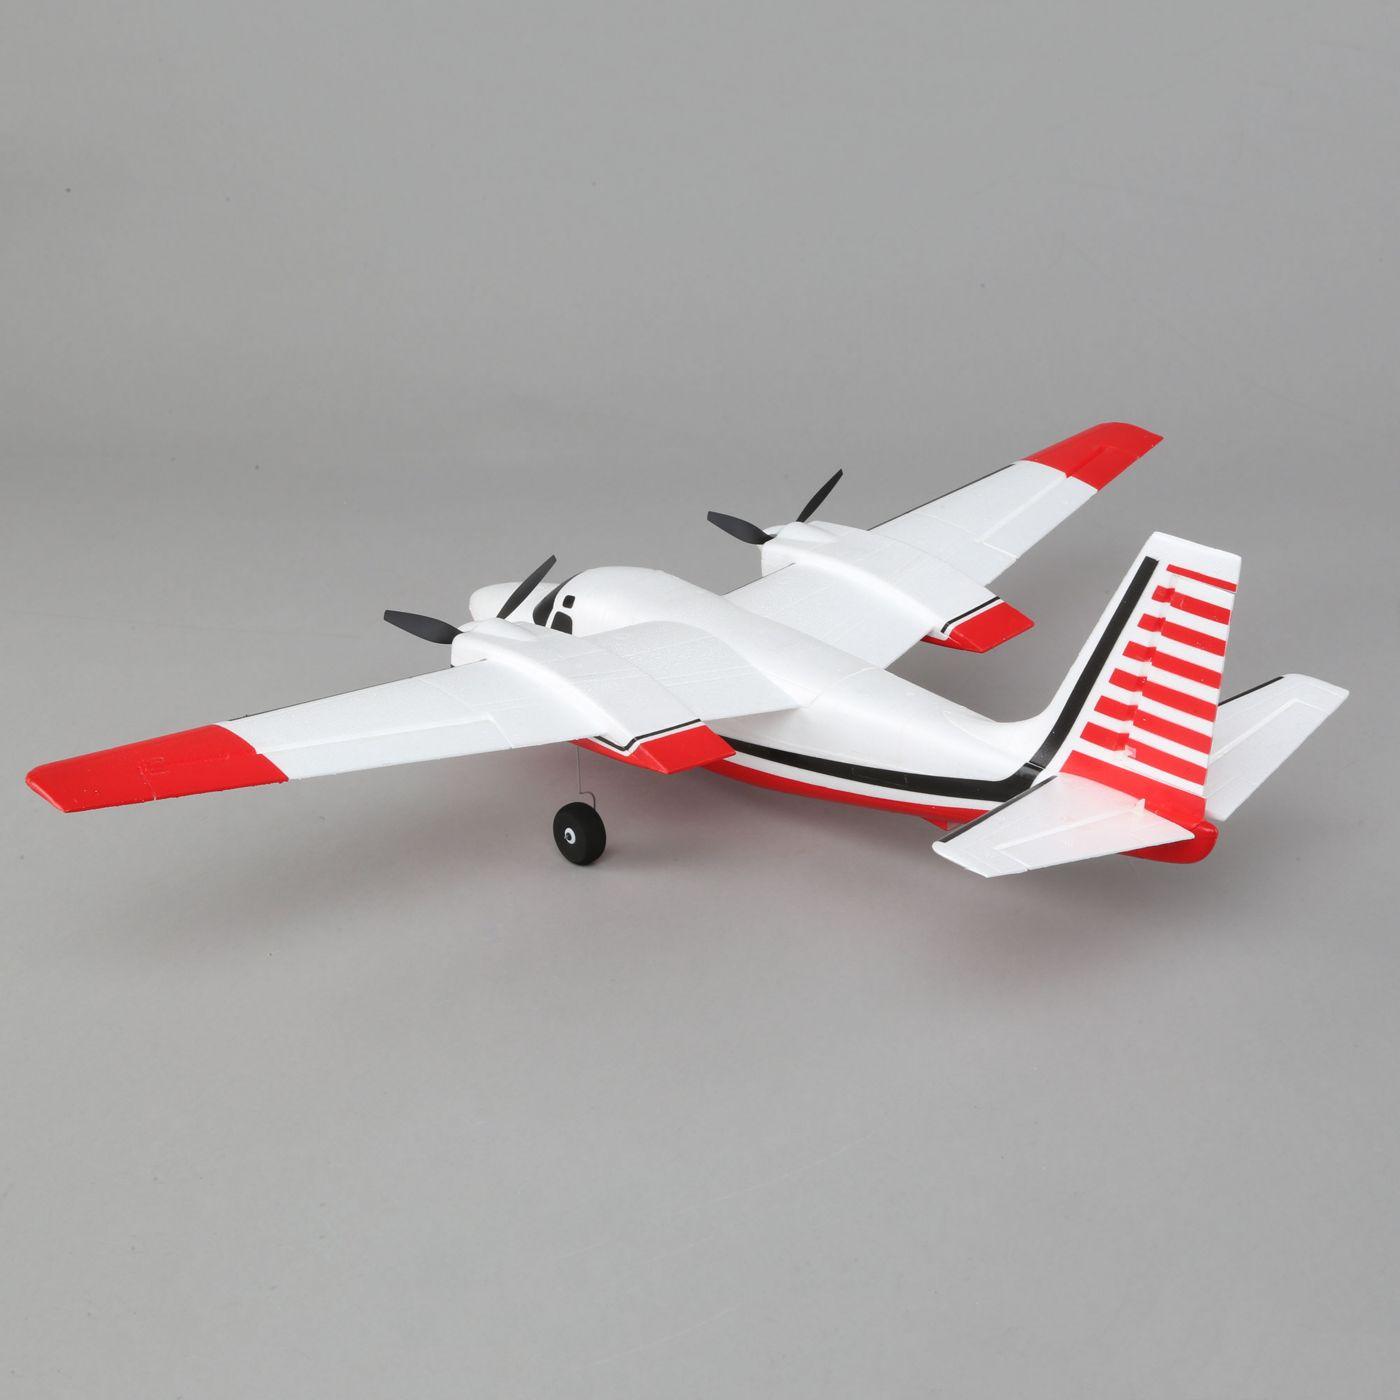 E-flite Aero Commander BNF Basic AS3X SAFE 05